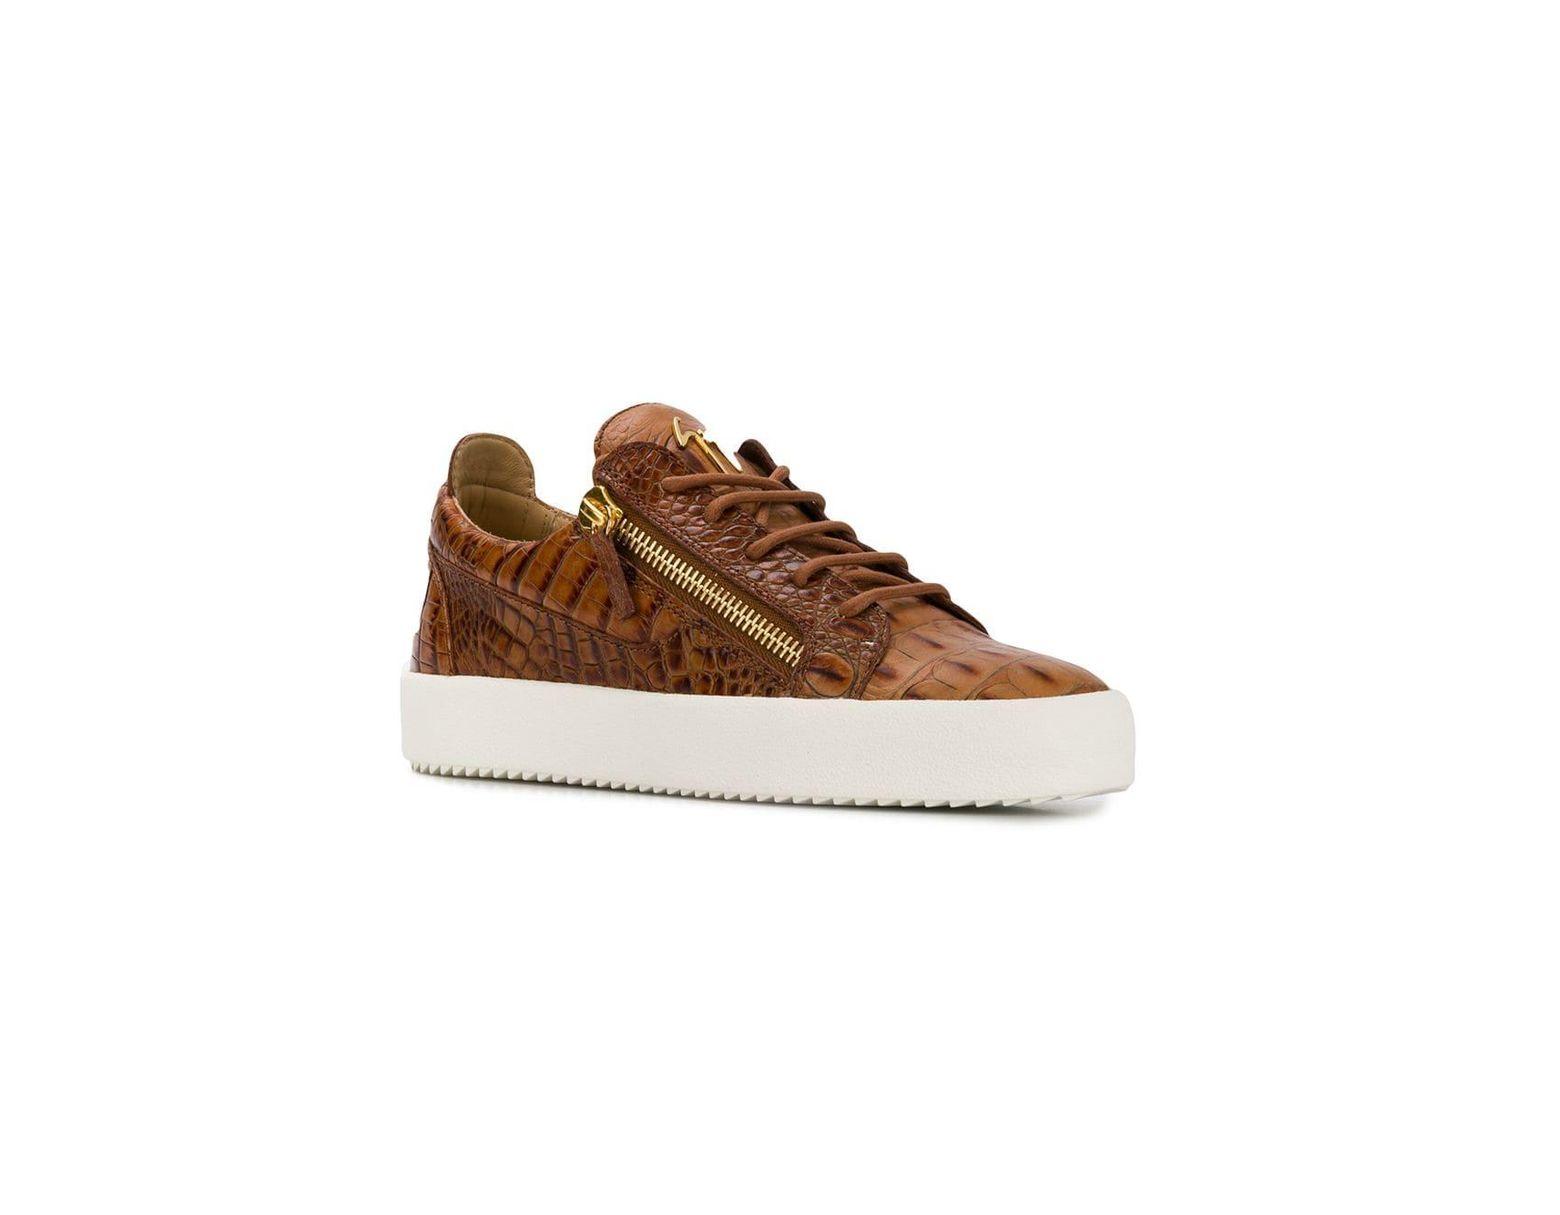 cb7d5bf5a5f6d Giuseppe Zanotti Kriss Crocodile Effect Sneakers in Brown for Men - Lyst